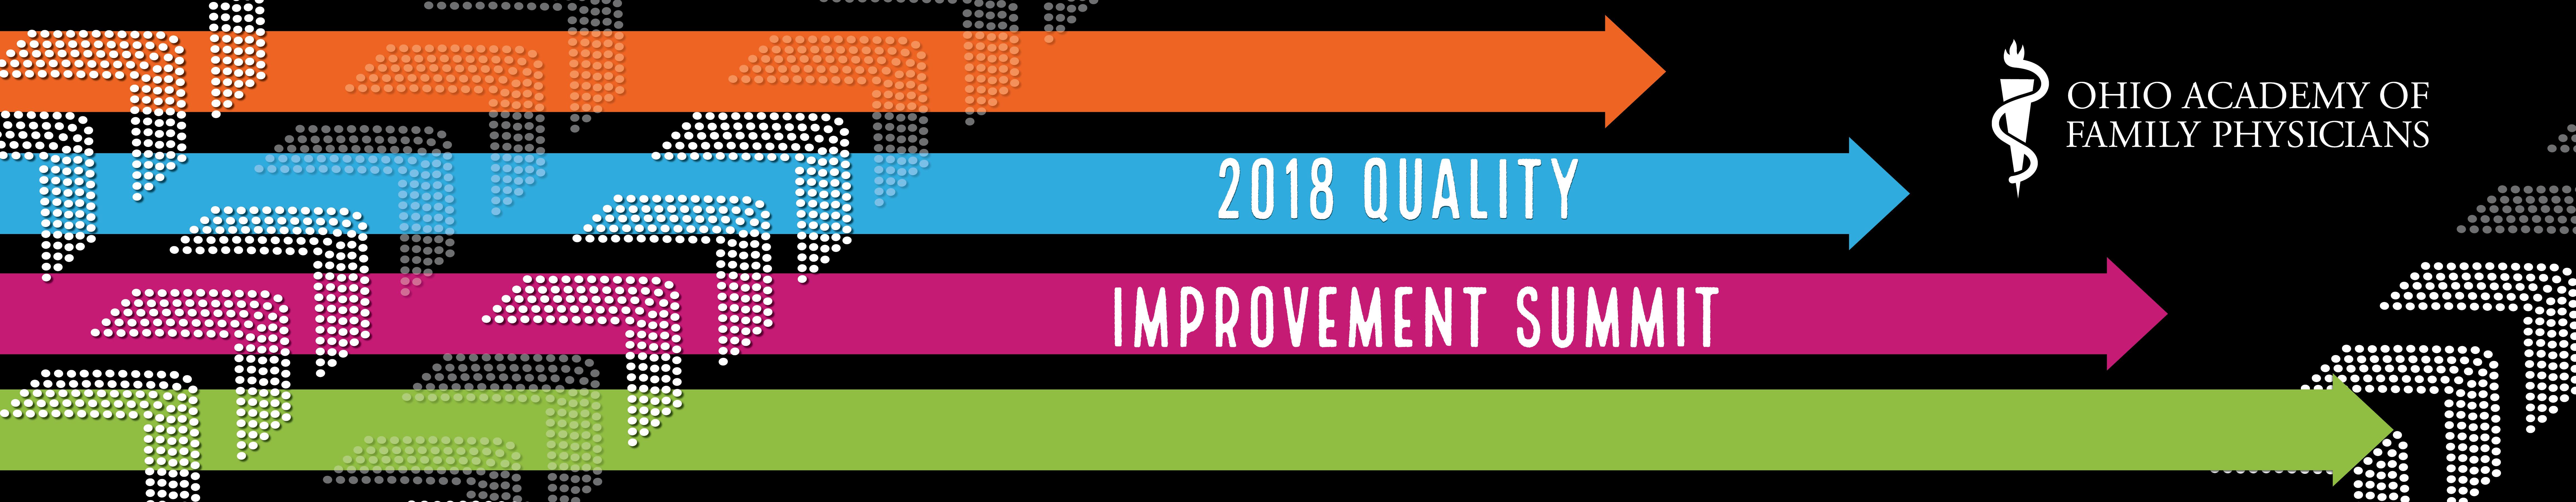 2018 Quality Improvement Summit